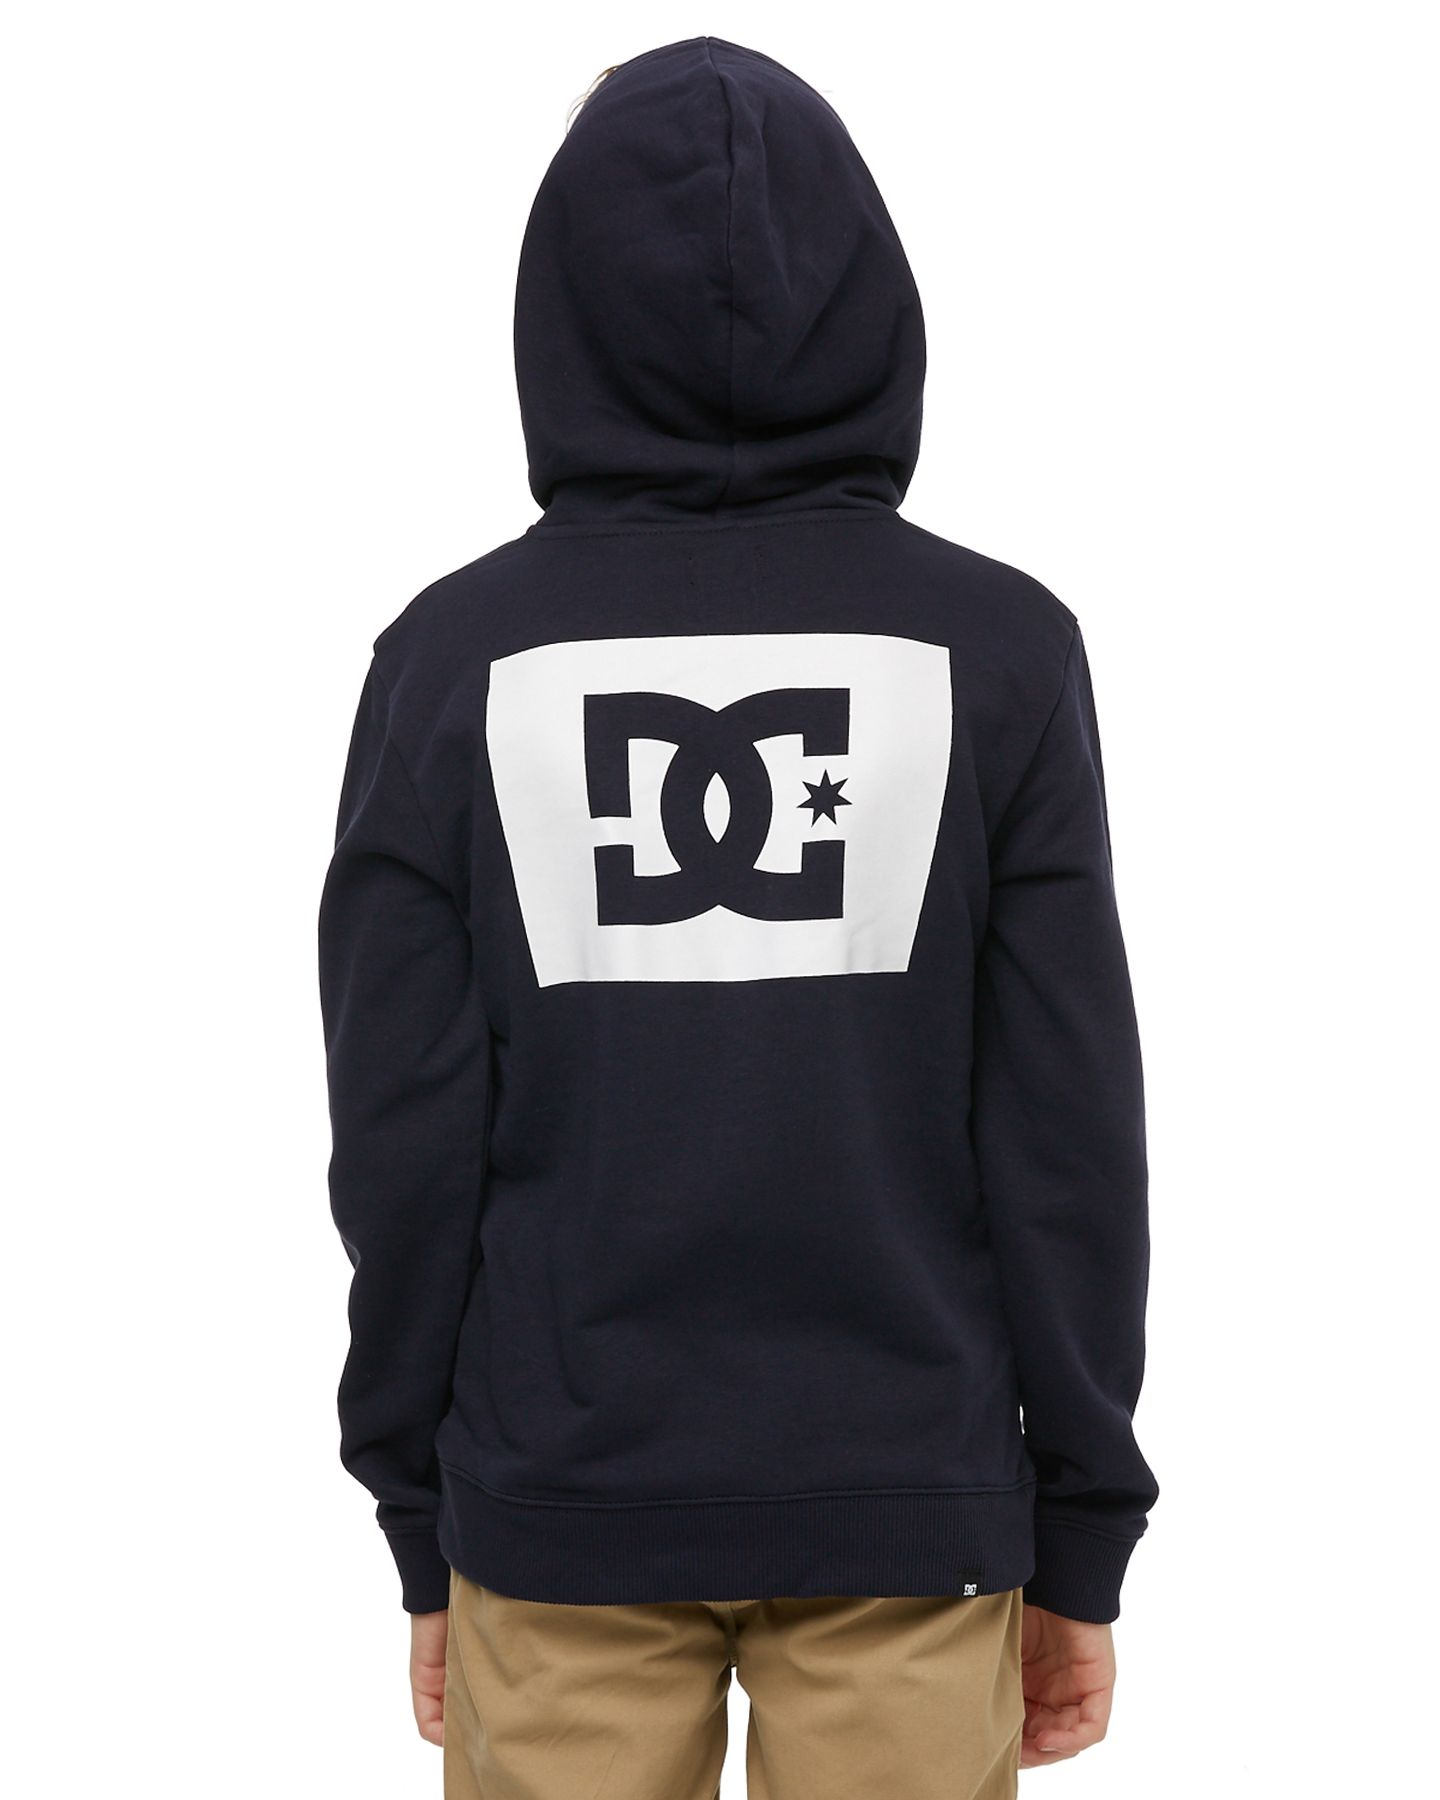 a1a18d23d4 Dc Shoes Kids Boys Stage Box Hoody - Dark Indigo